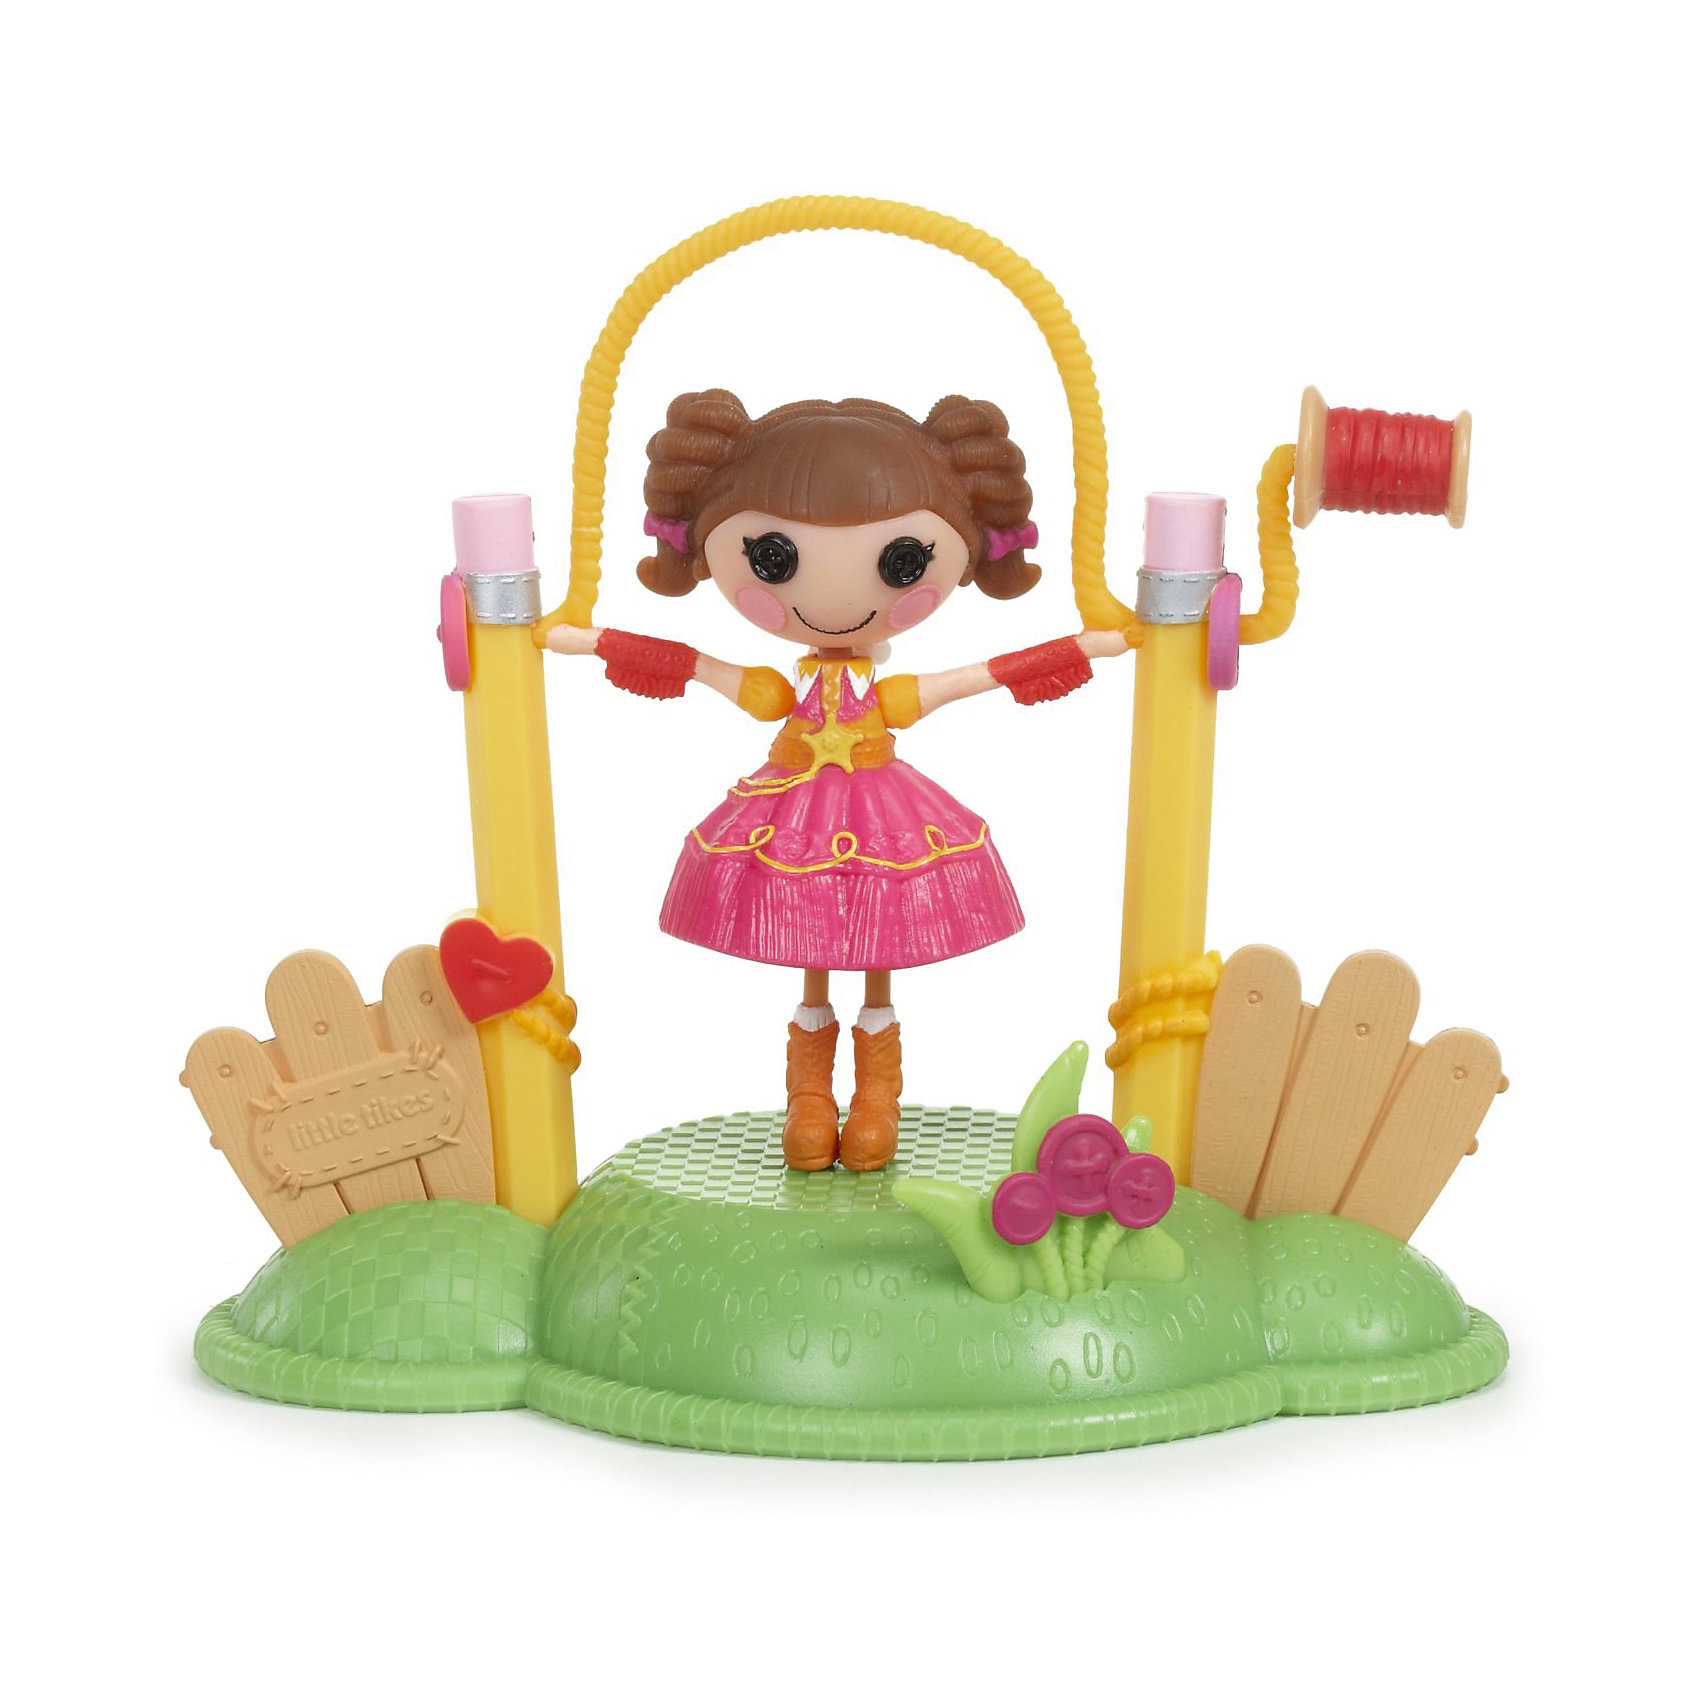 - Кукла Веселый спорт: Скакалка, Mini Lalaloopsy кукла lalaloopsy mini с интерьером в ассортименте